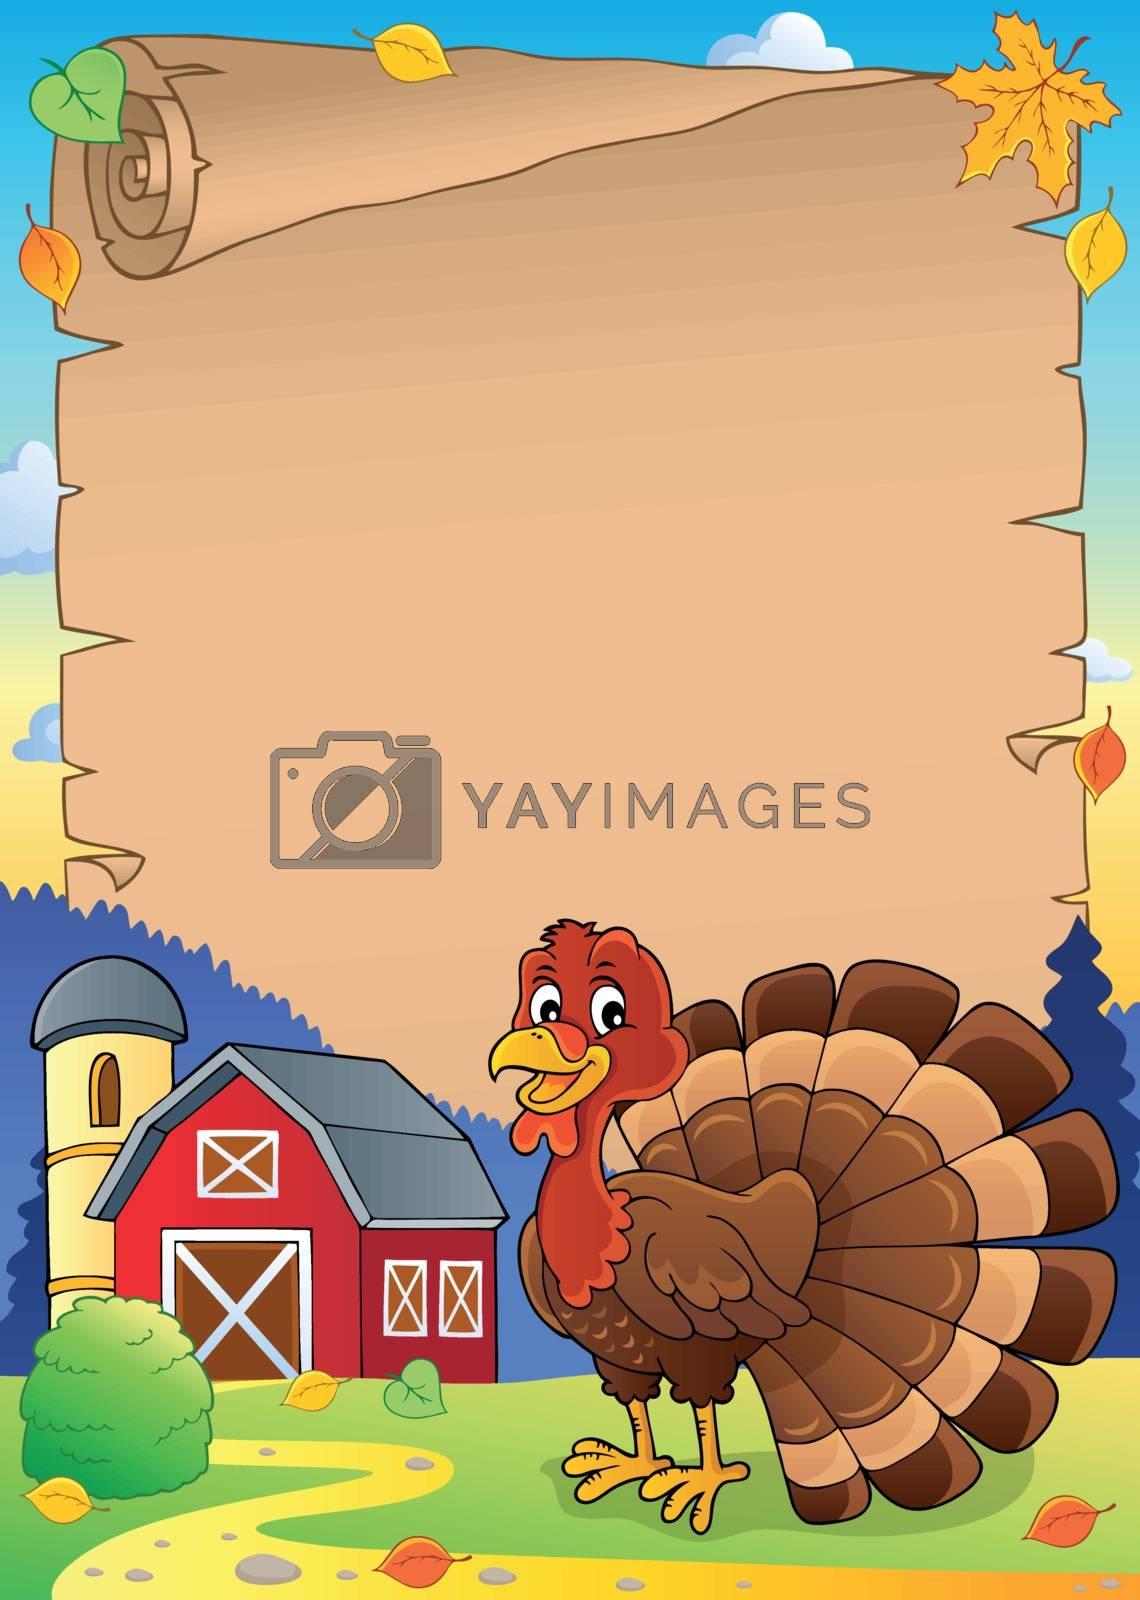 Turkey bird theme parchment 1 - eps10 vector illustration.